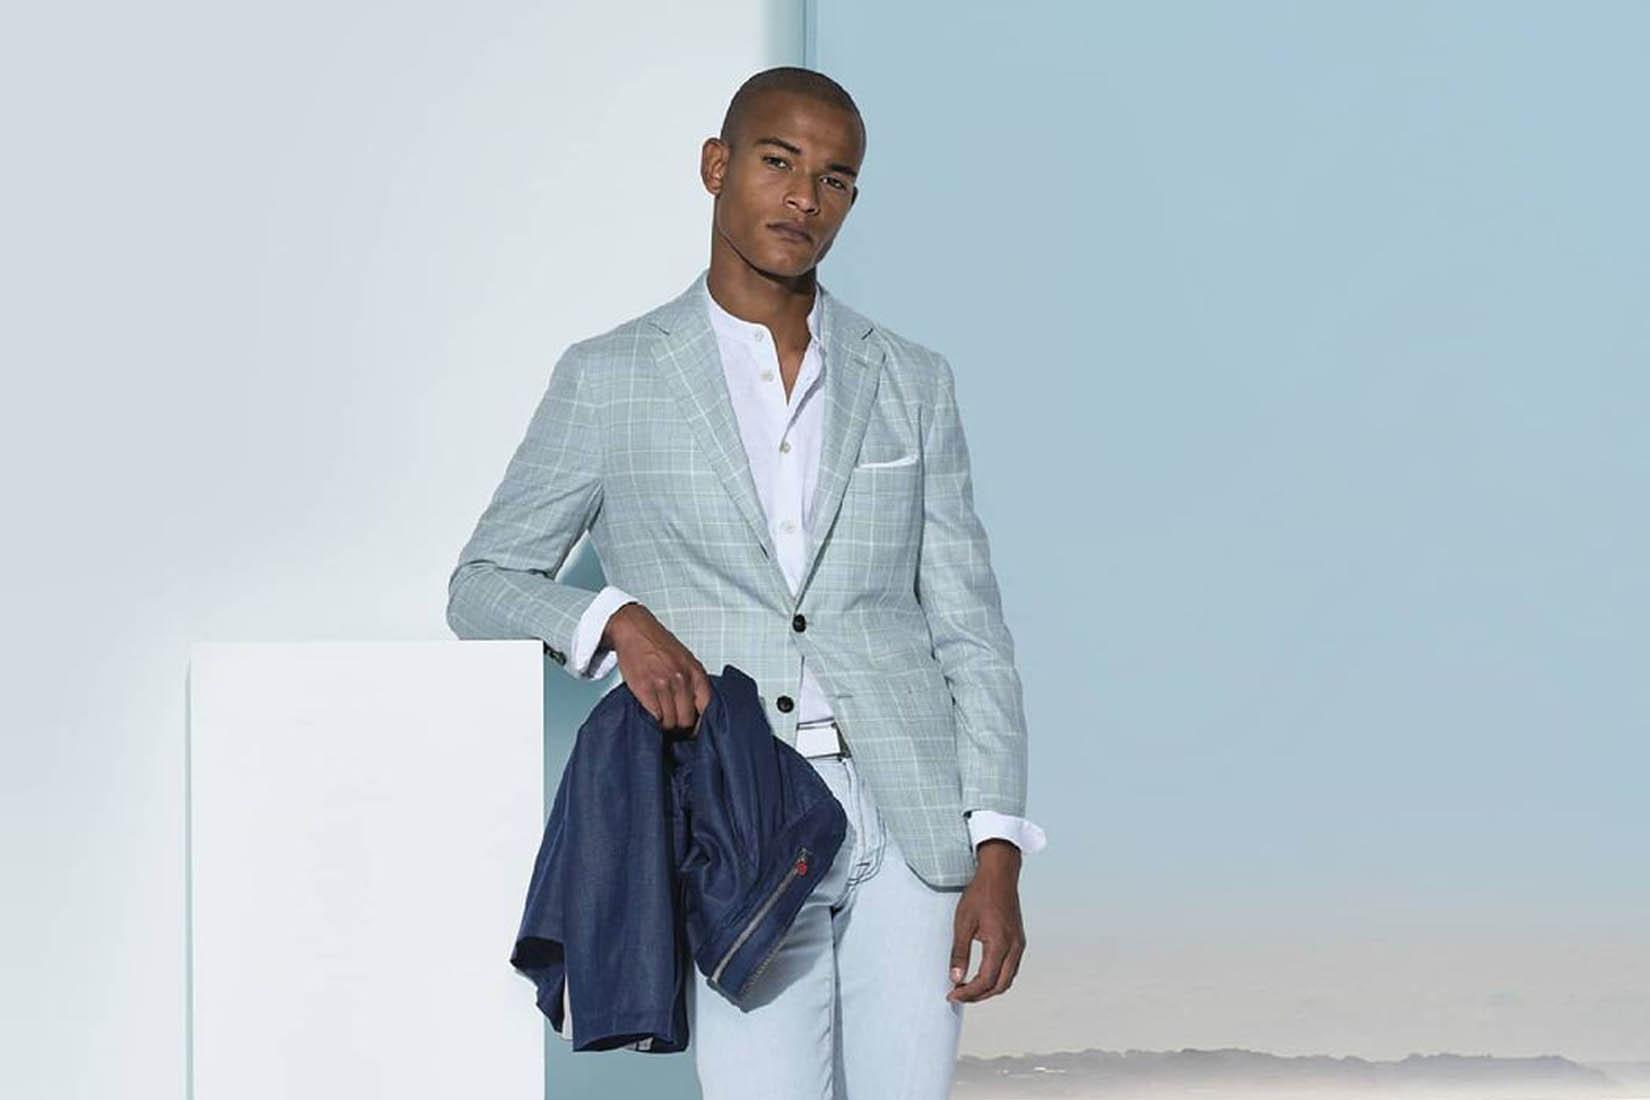 best suit brands men kiton review Luxe Digital